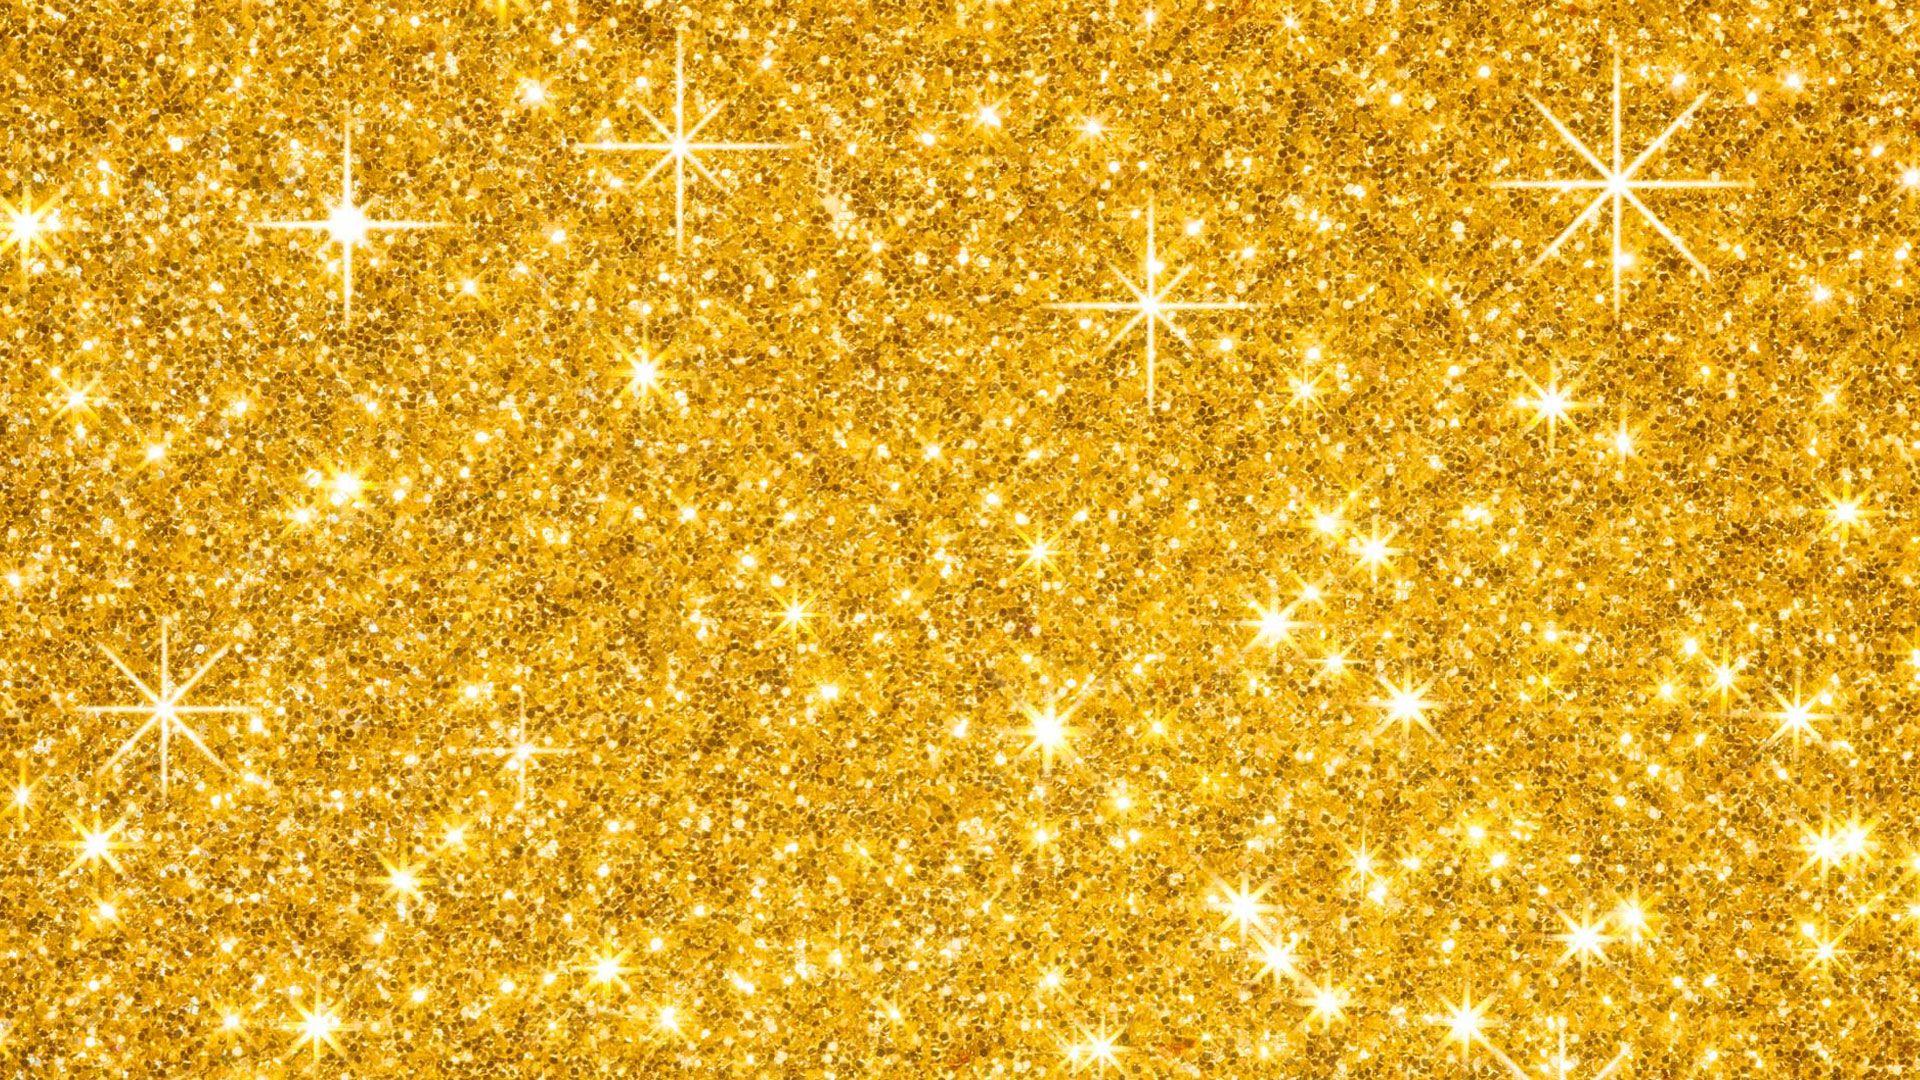 Gold Wallpaper Desktop Eij Gold Sparkle Wallpaper Sparkle Wallpaper Gold Glitter Wallpaper Hd